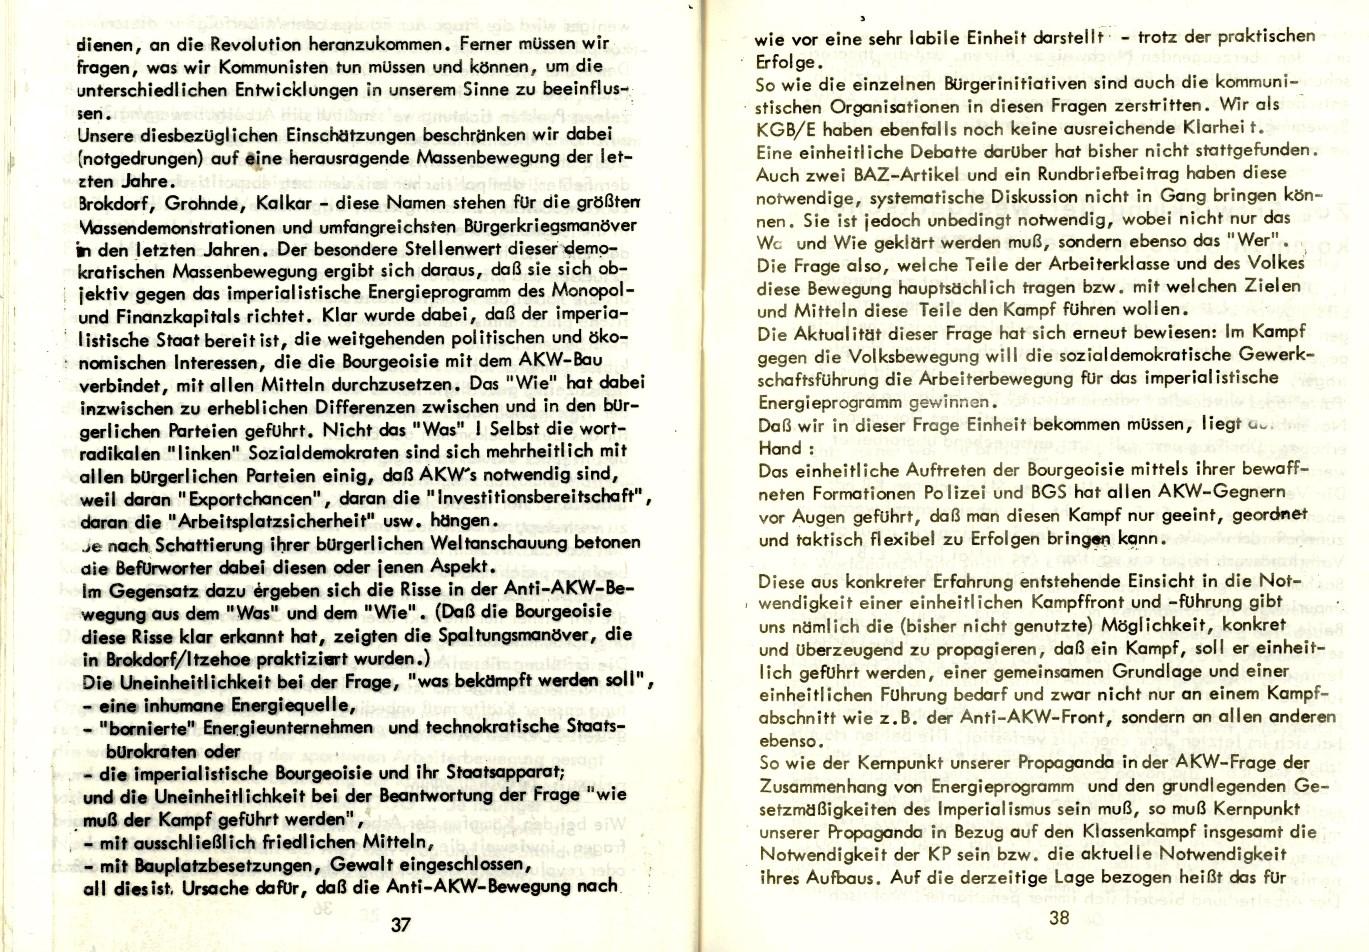 KGBE_1978_Resolutionen_20